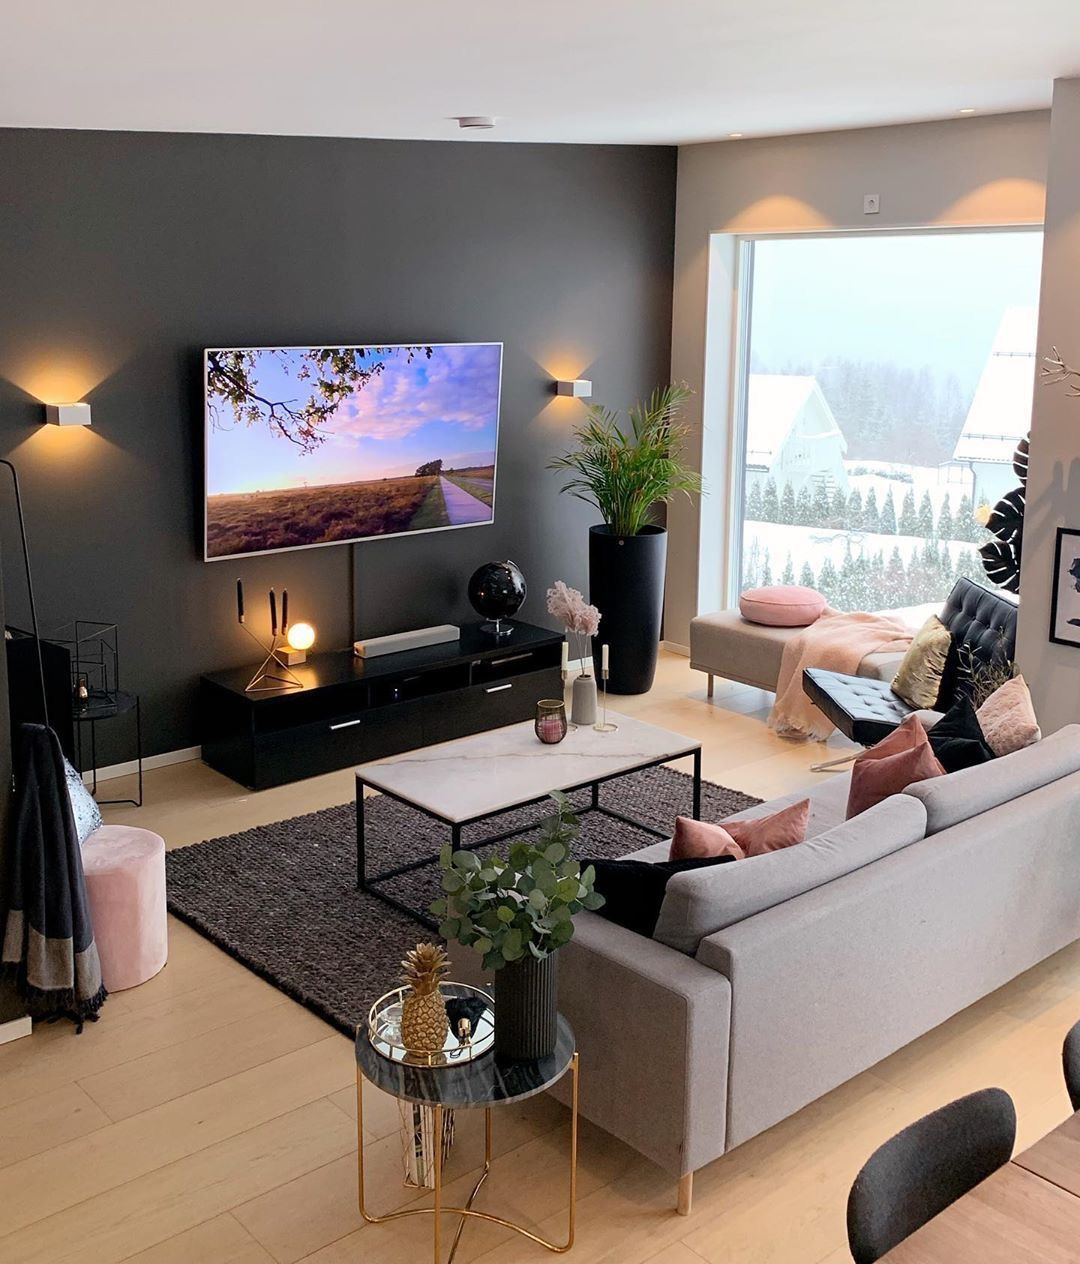 Pinterest // @JusLiv in 2020 | Simple living room, Modern ...